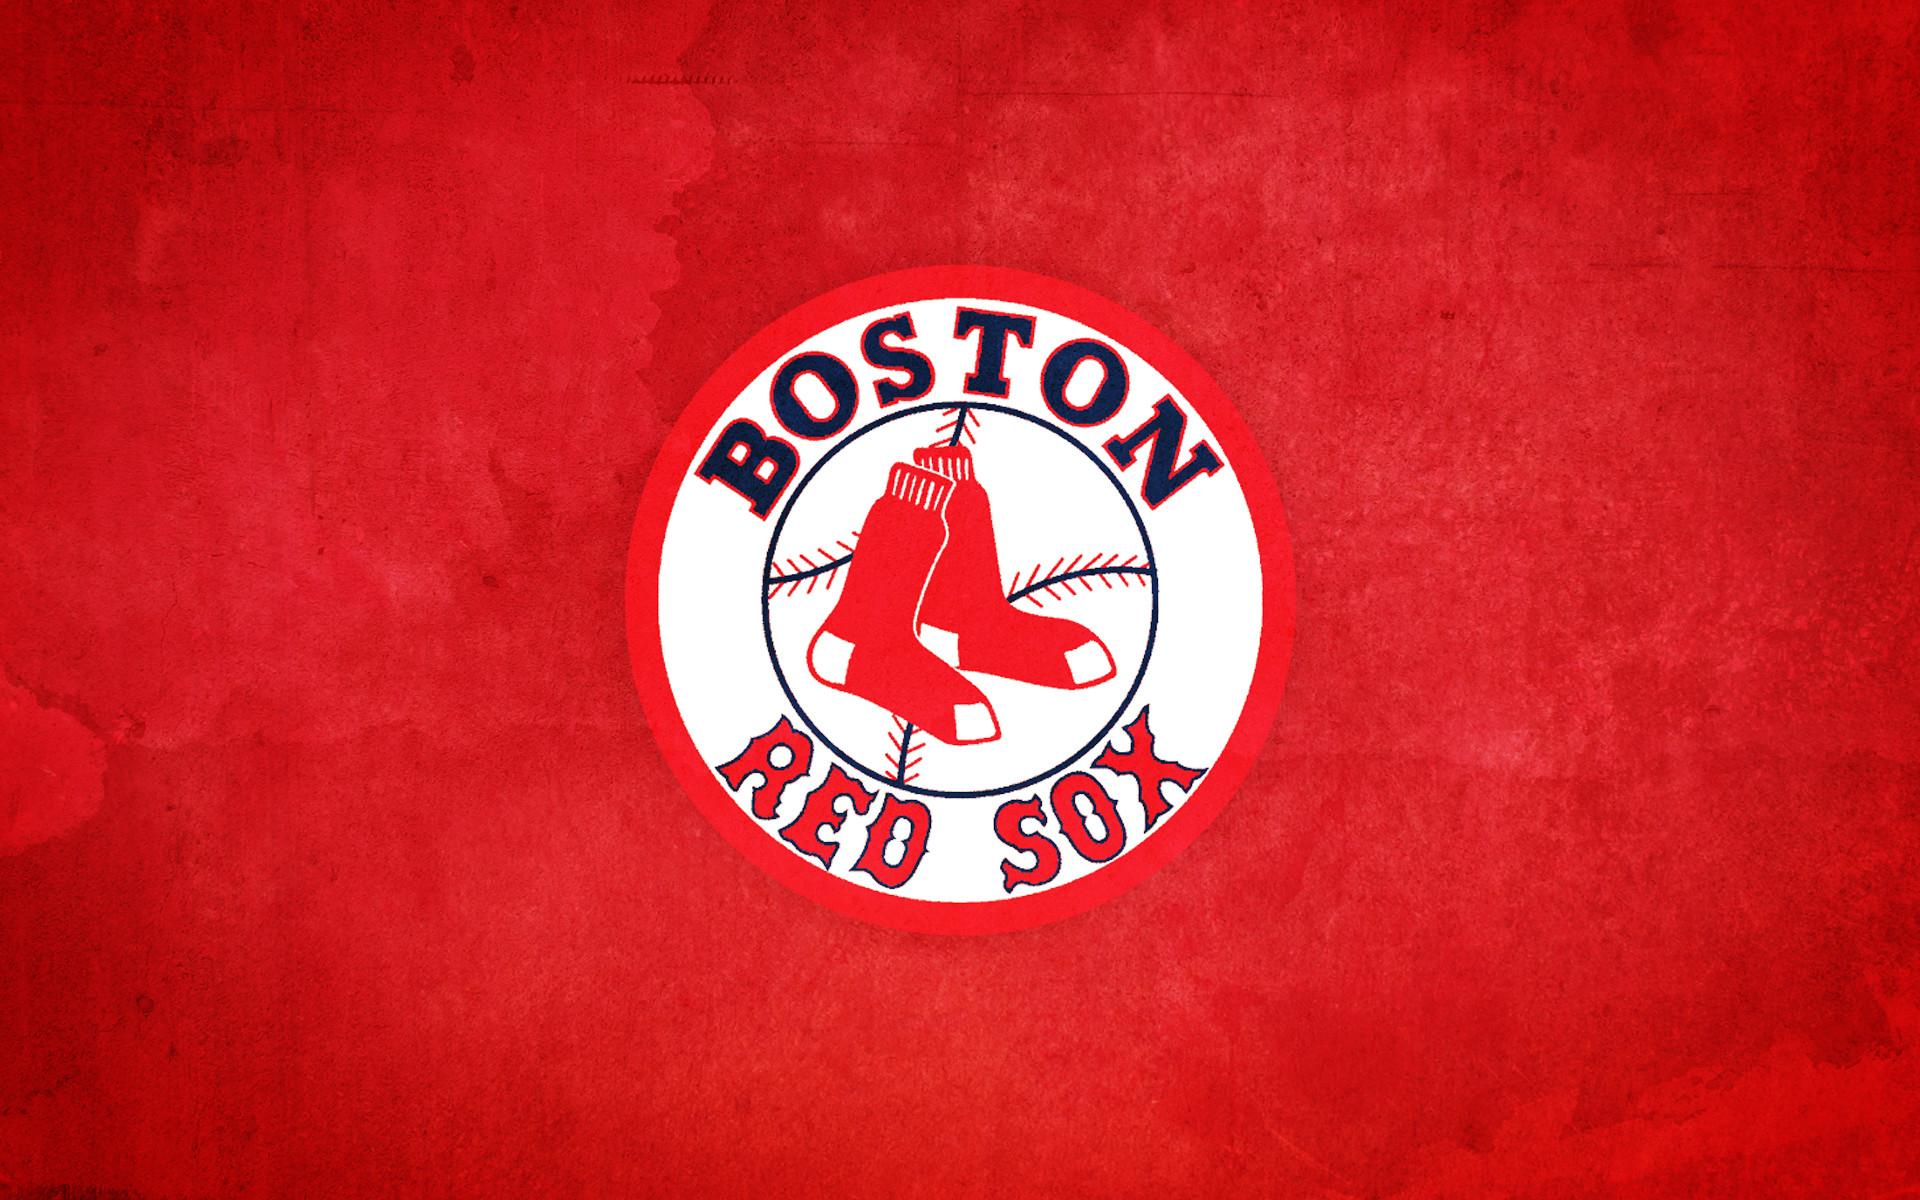 2048x1536 CINCINNATI REDS Mlb Baseball (13) Wallpaper | 2048x1536 | 229508 .